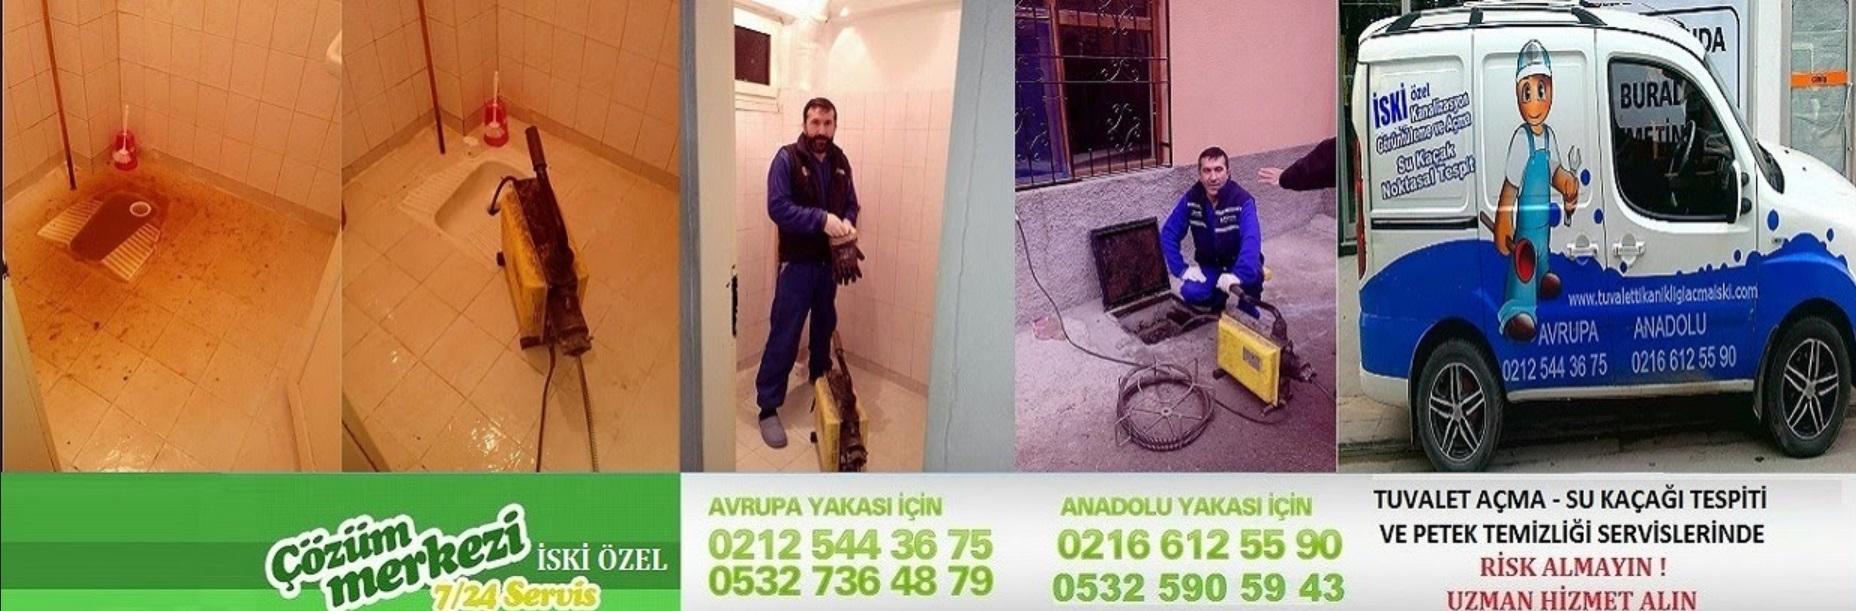 Tuvalet , Lavabo Açma 49 TL